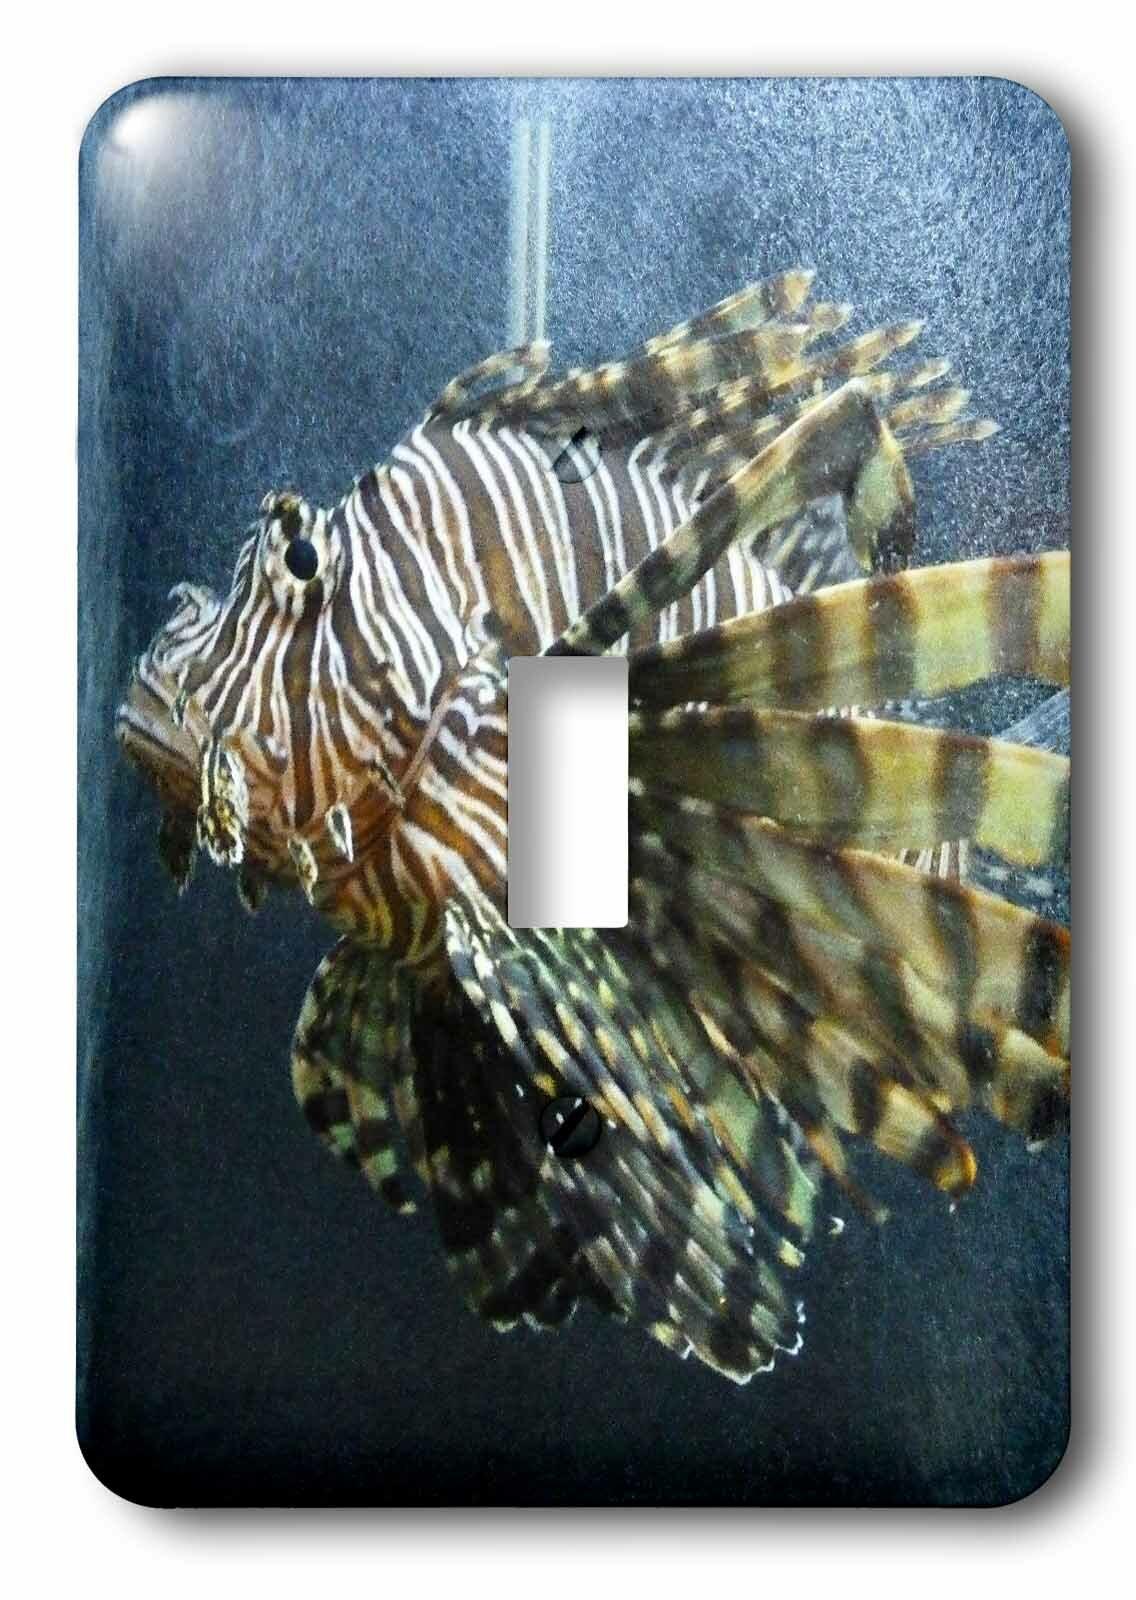 3drose Switch Lion Fish 1 Gang Toggle Light Switch Wall Plate Wayfair